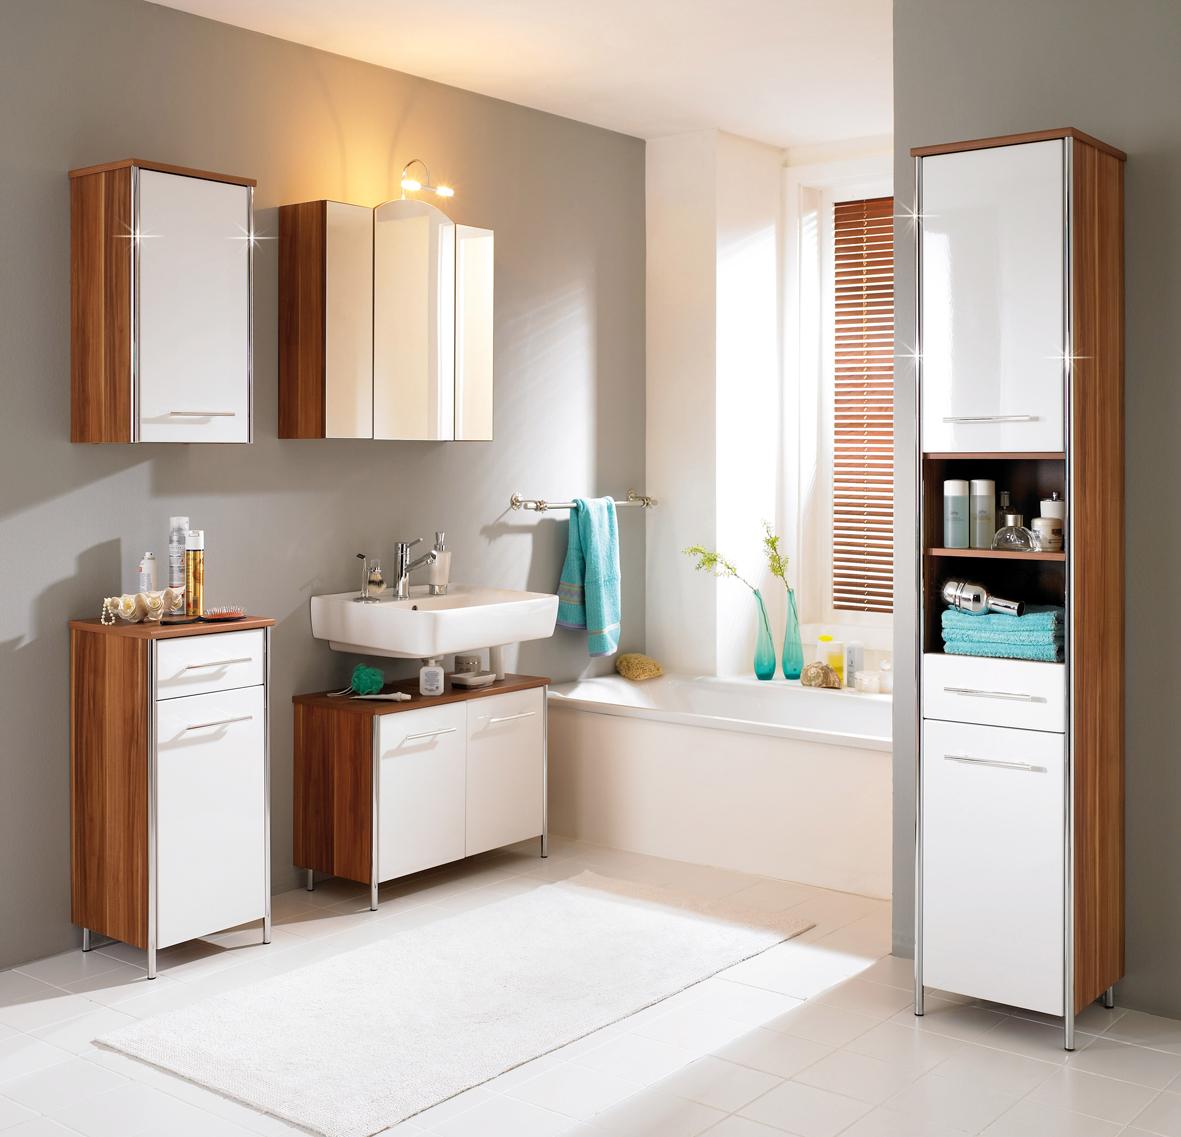 Modern Bathroom Cabinets Storage beautiful bathroom cabinet design vanity ideas